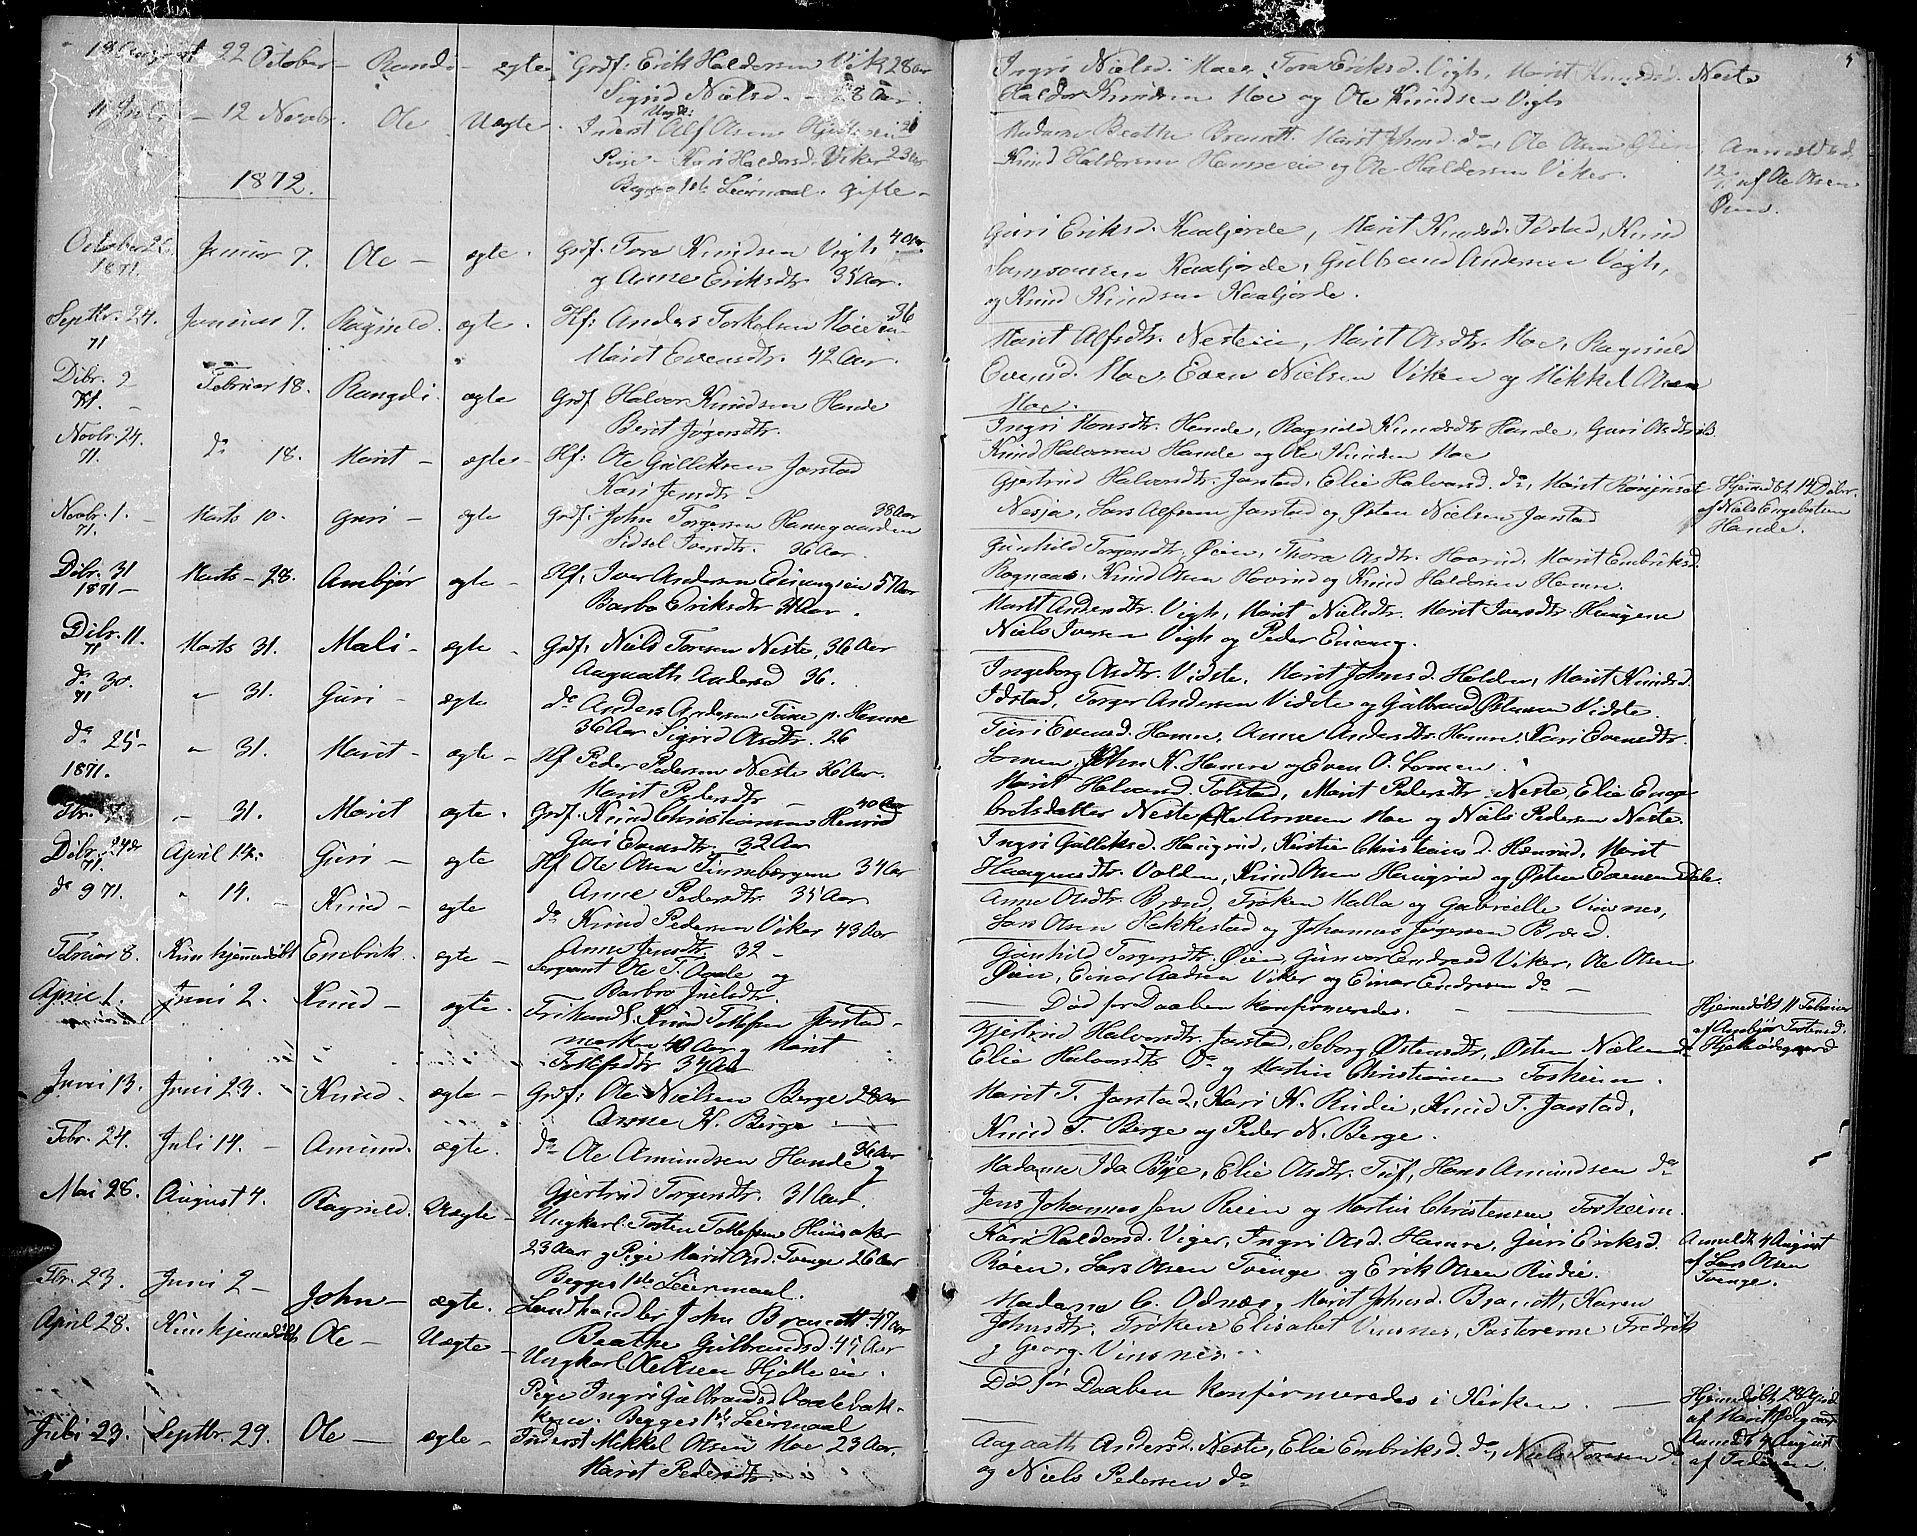 SAH, Vestre Slidre prestekontor, Klokkerbok nr. 1, 1869-1882, s. 5